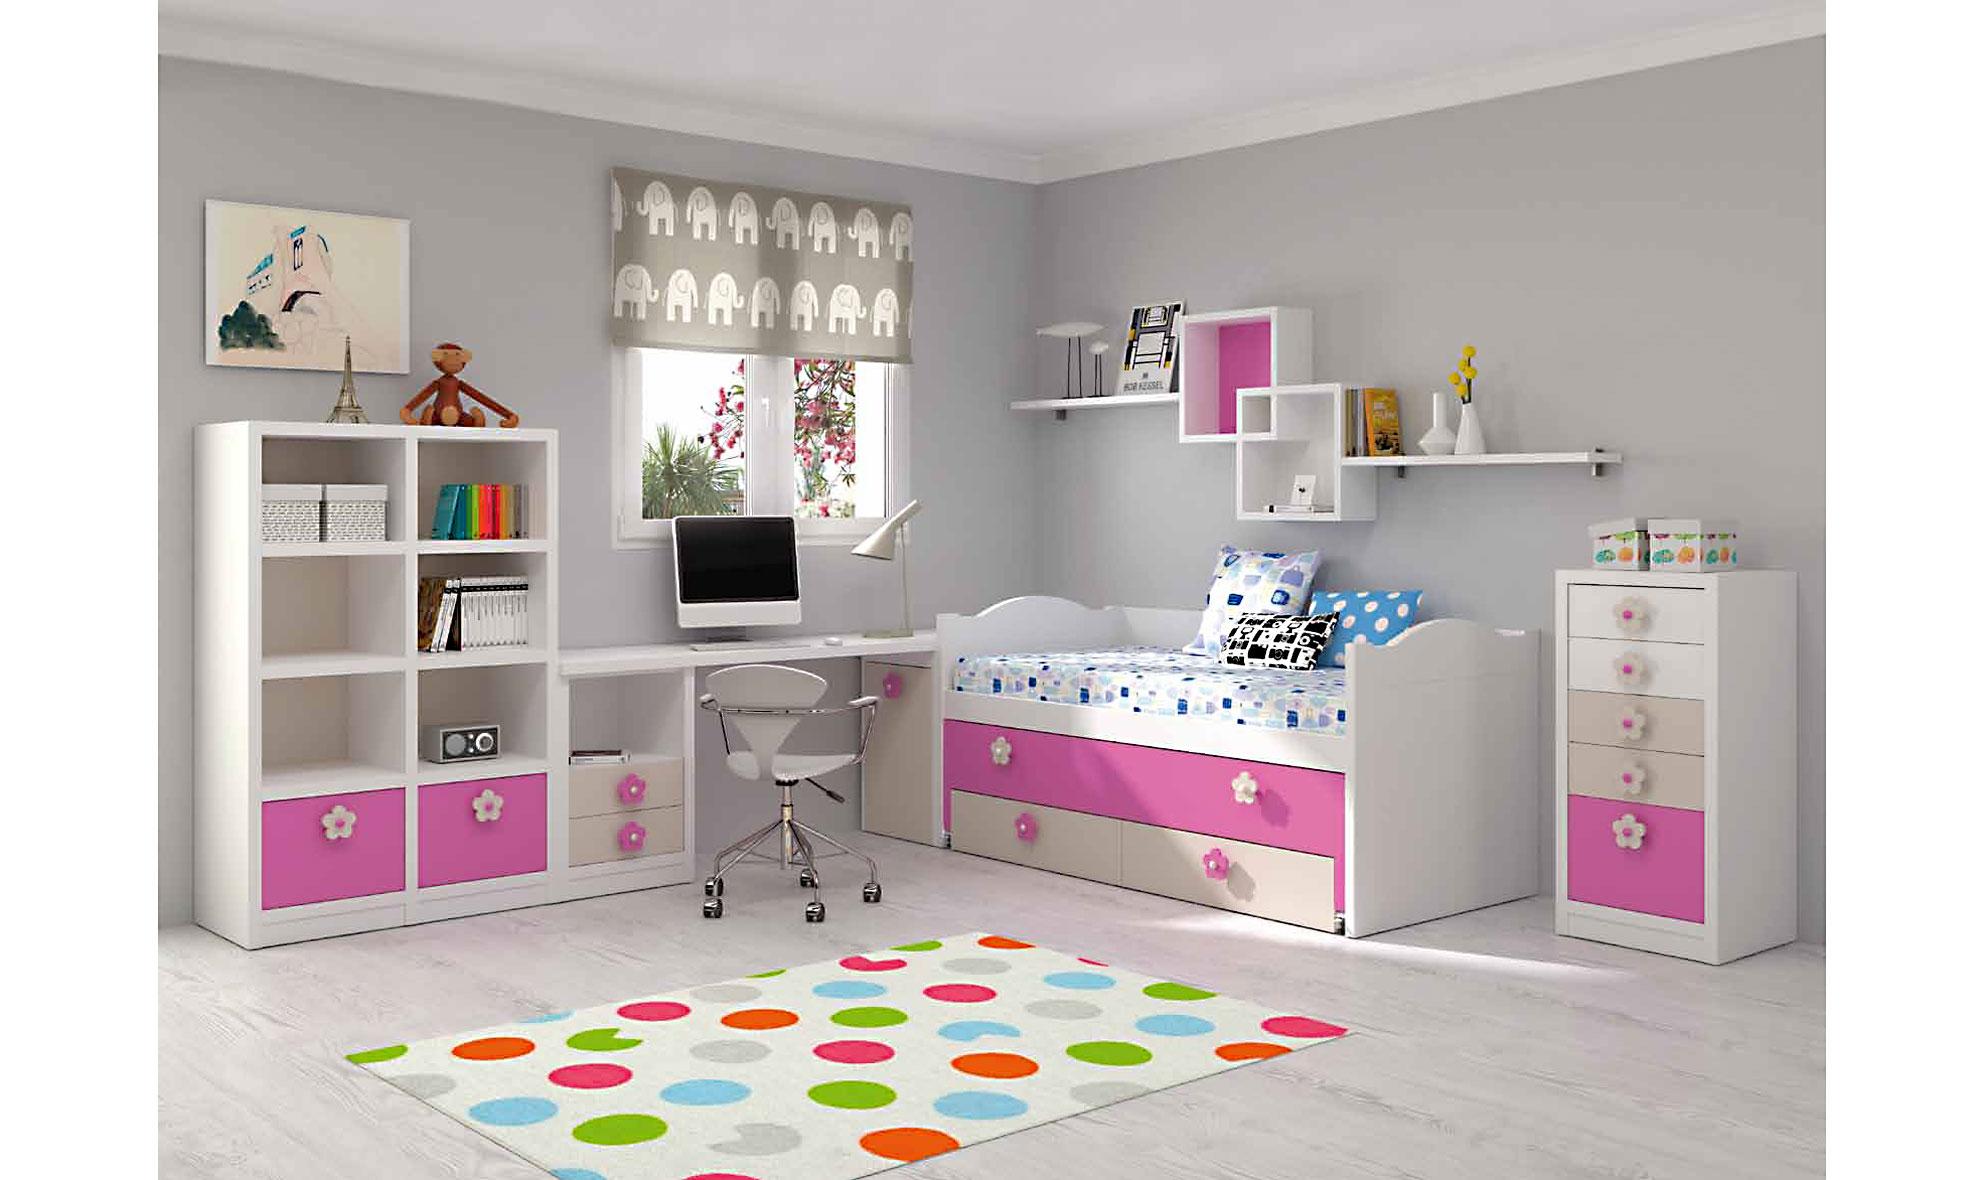 Habitaci n infantil lucia en - Ver habitaciones infantiles ...